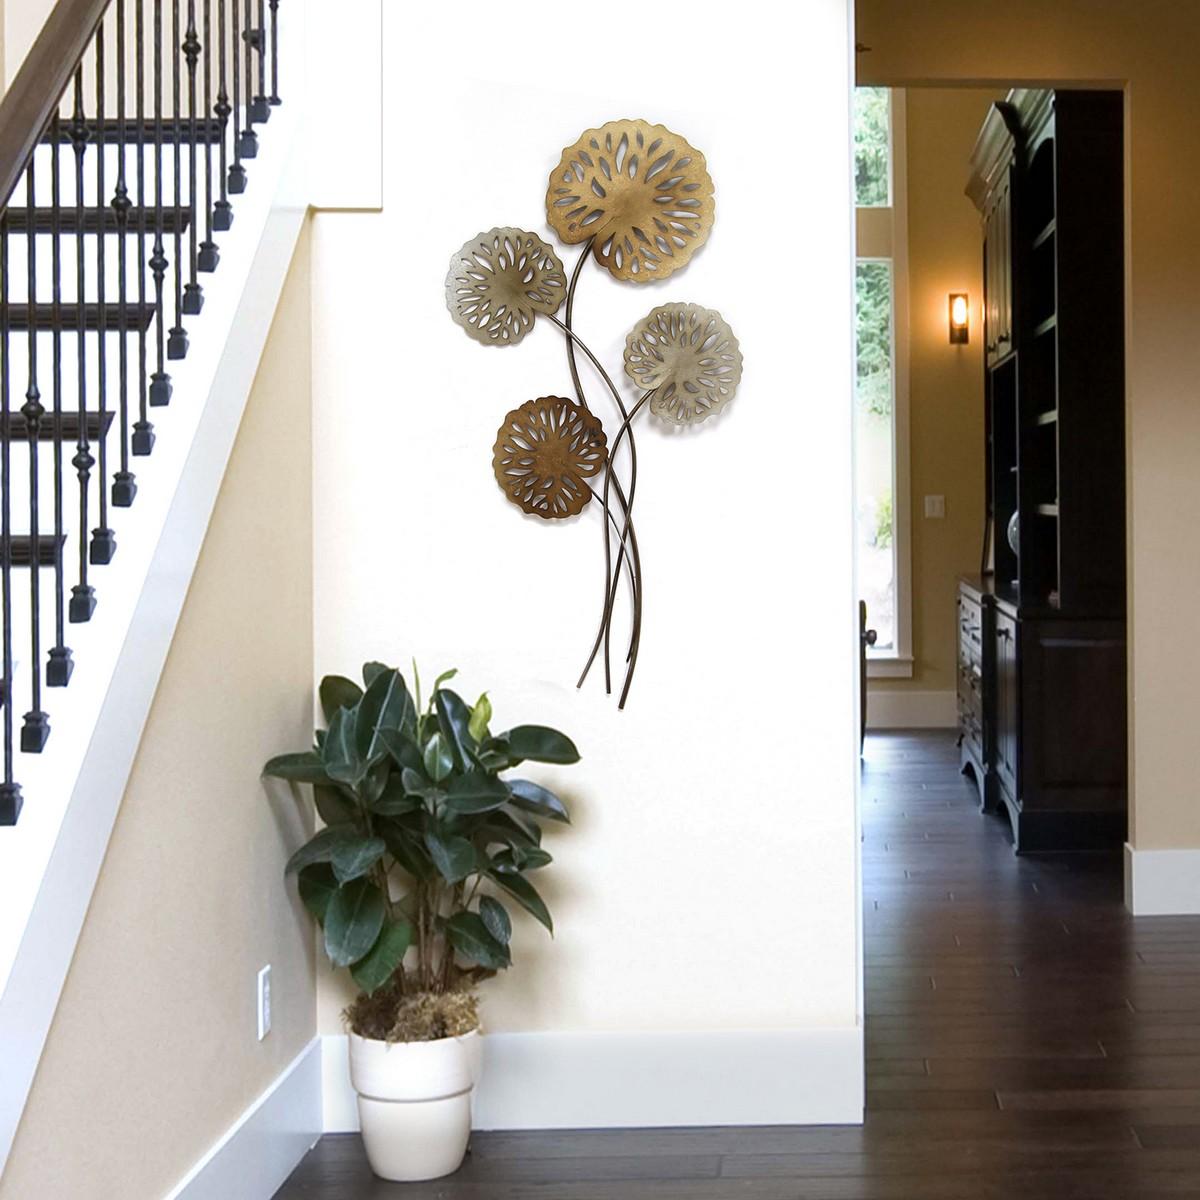 Stratton Home Decor Water Lilies Wall Decor - Multi Metallic